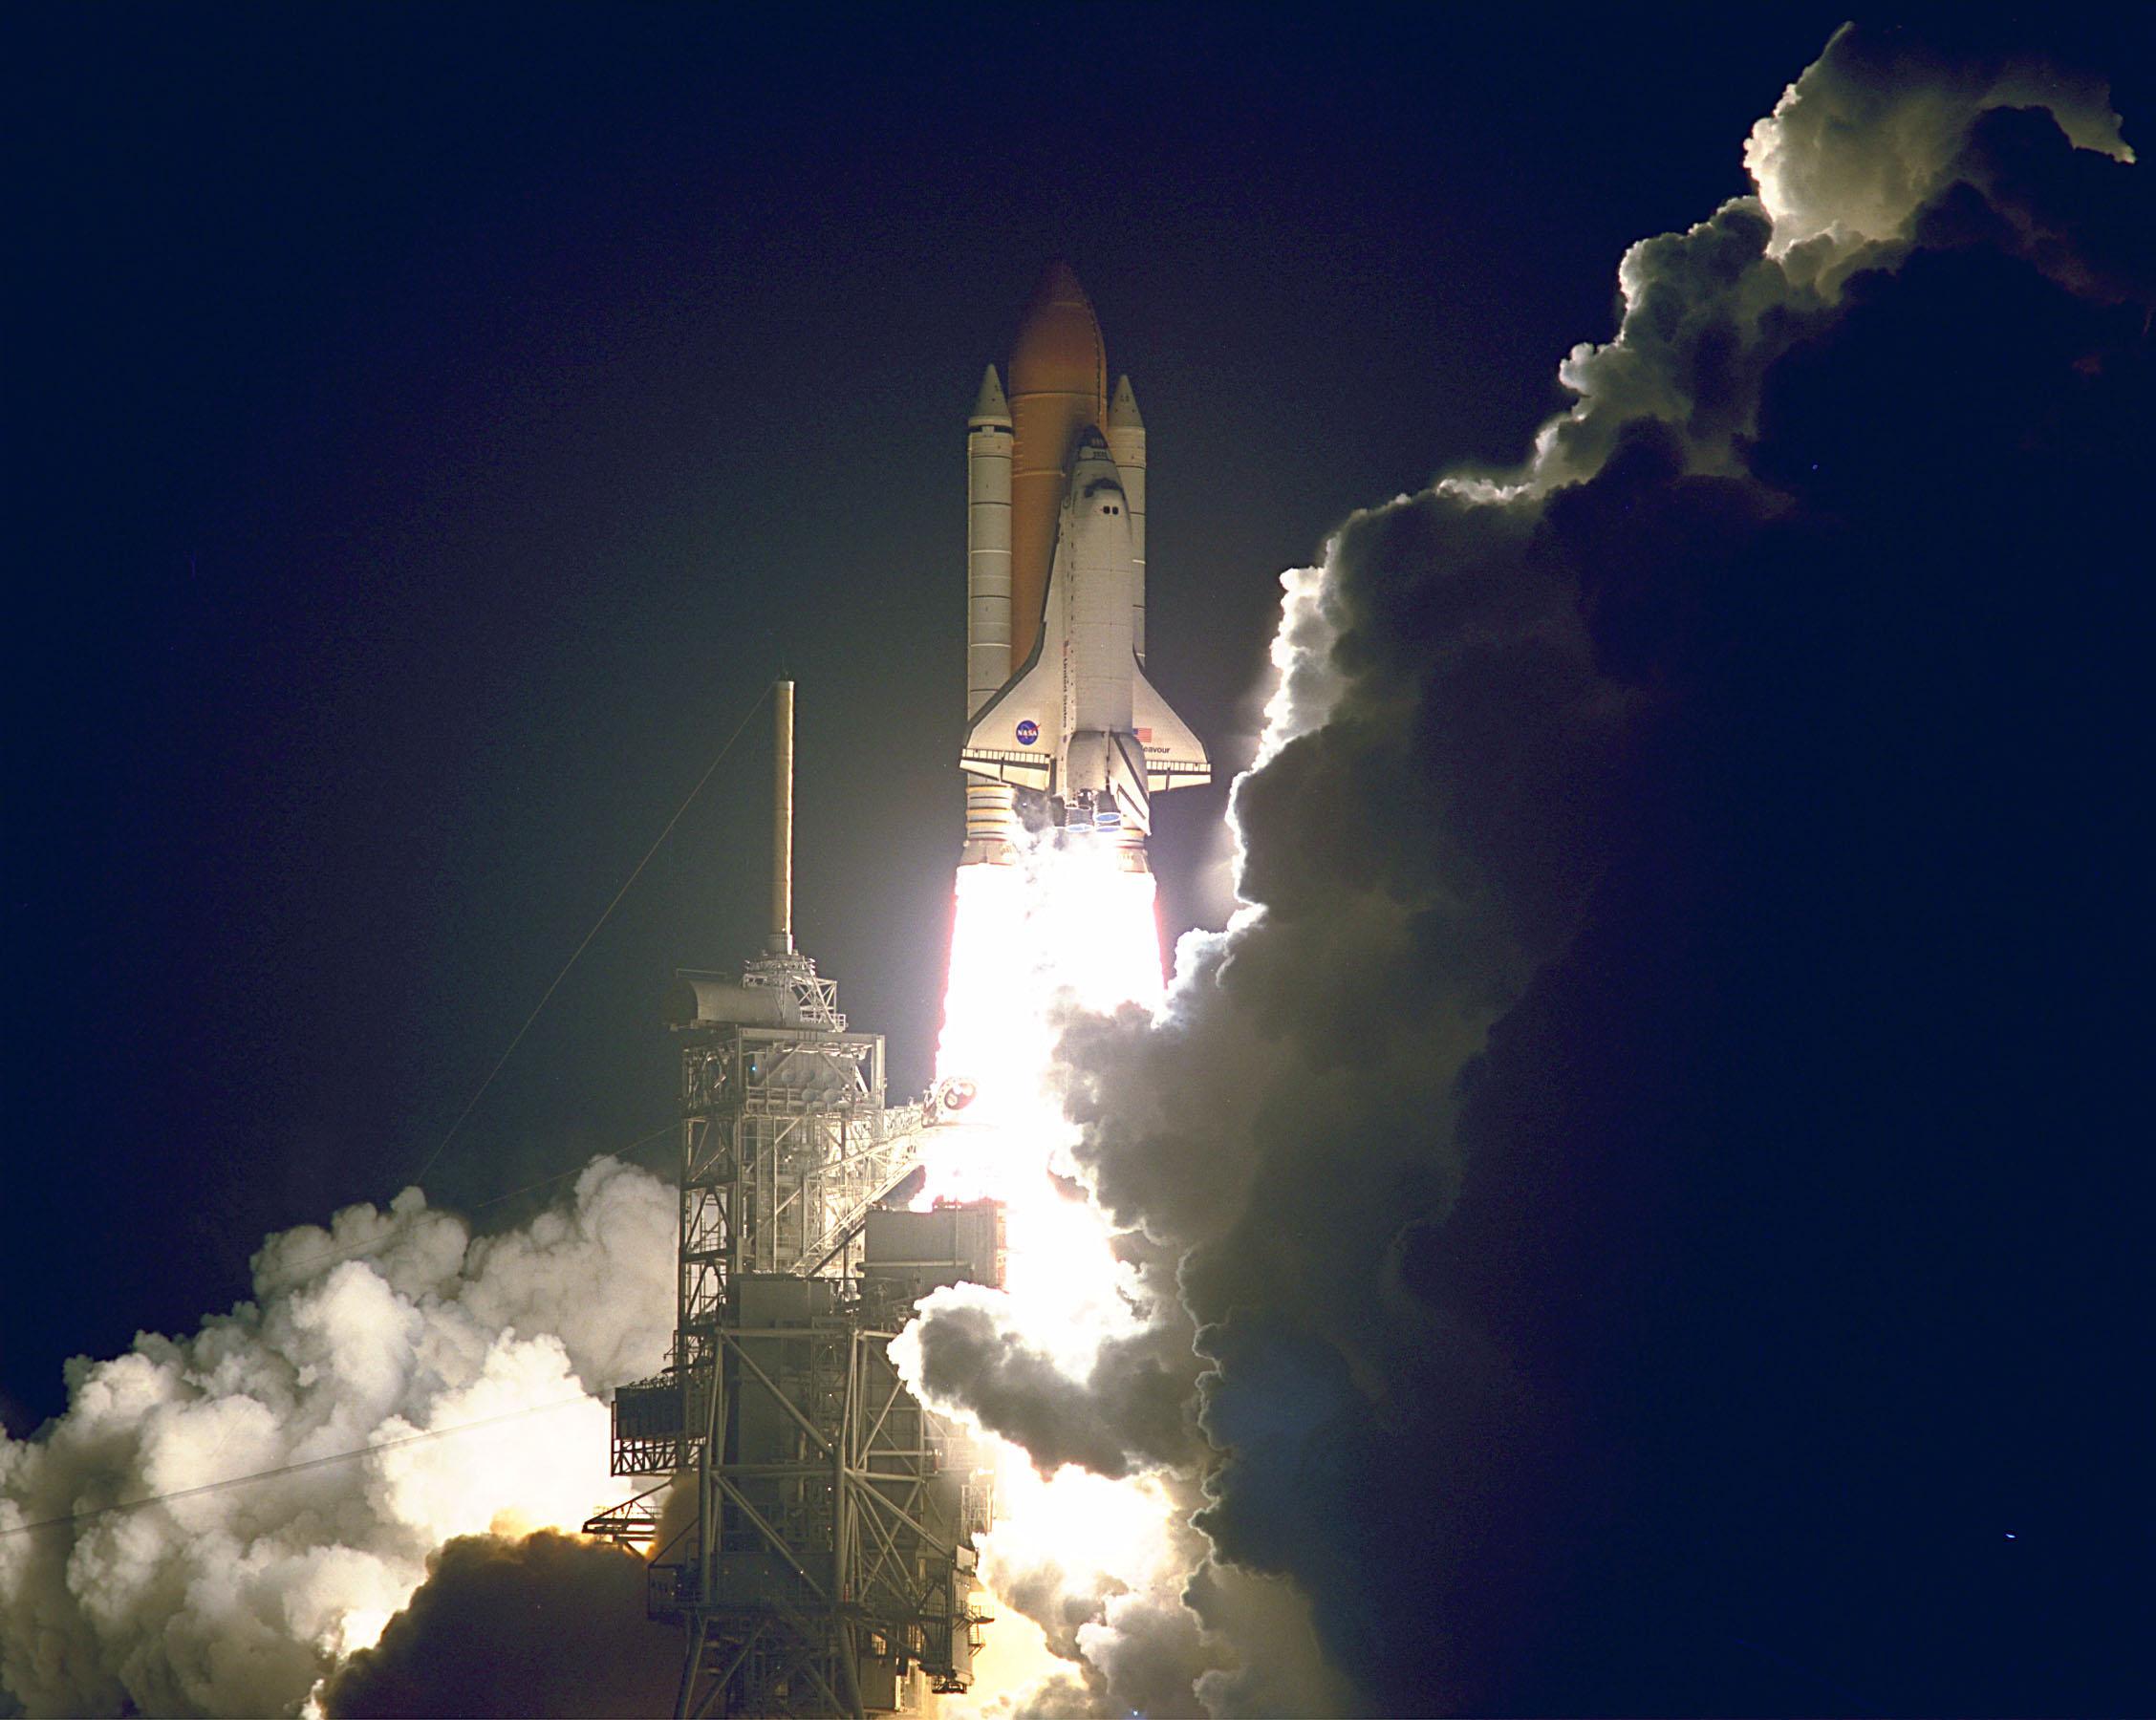 NASA Samples Turn Into 'Space Music' on '80UA' EP